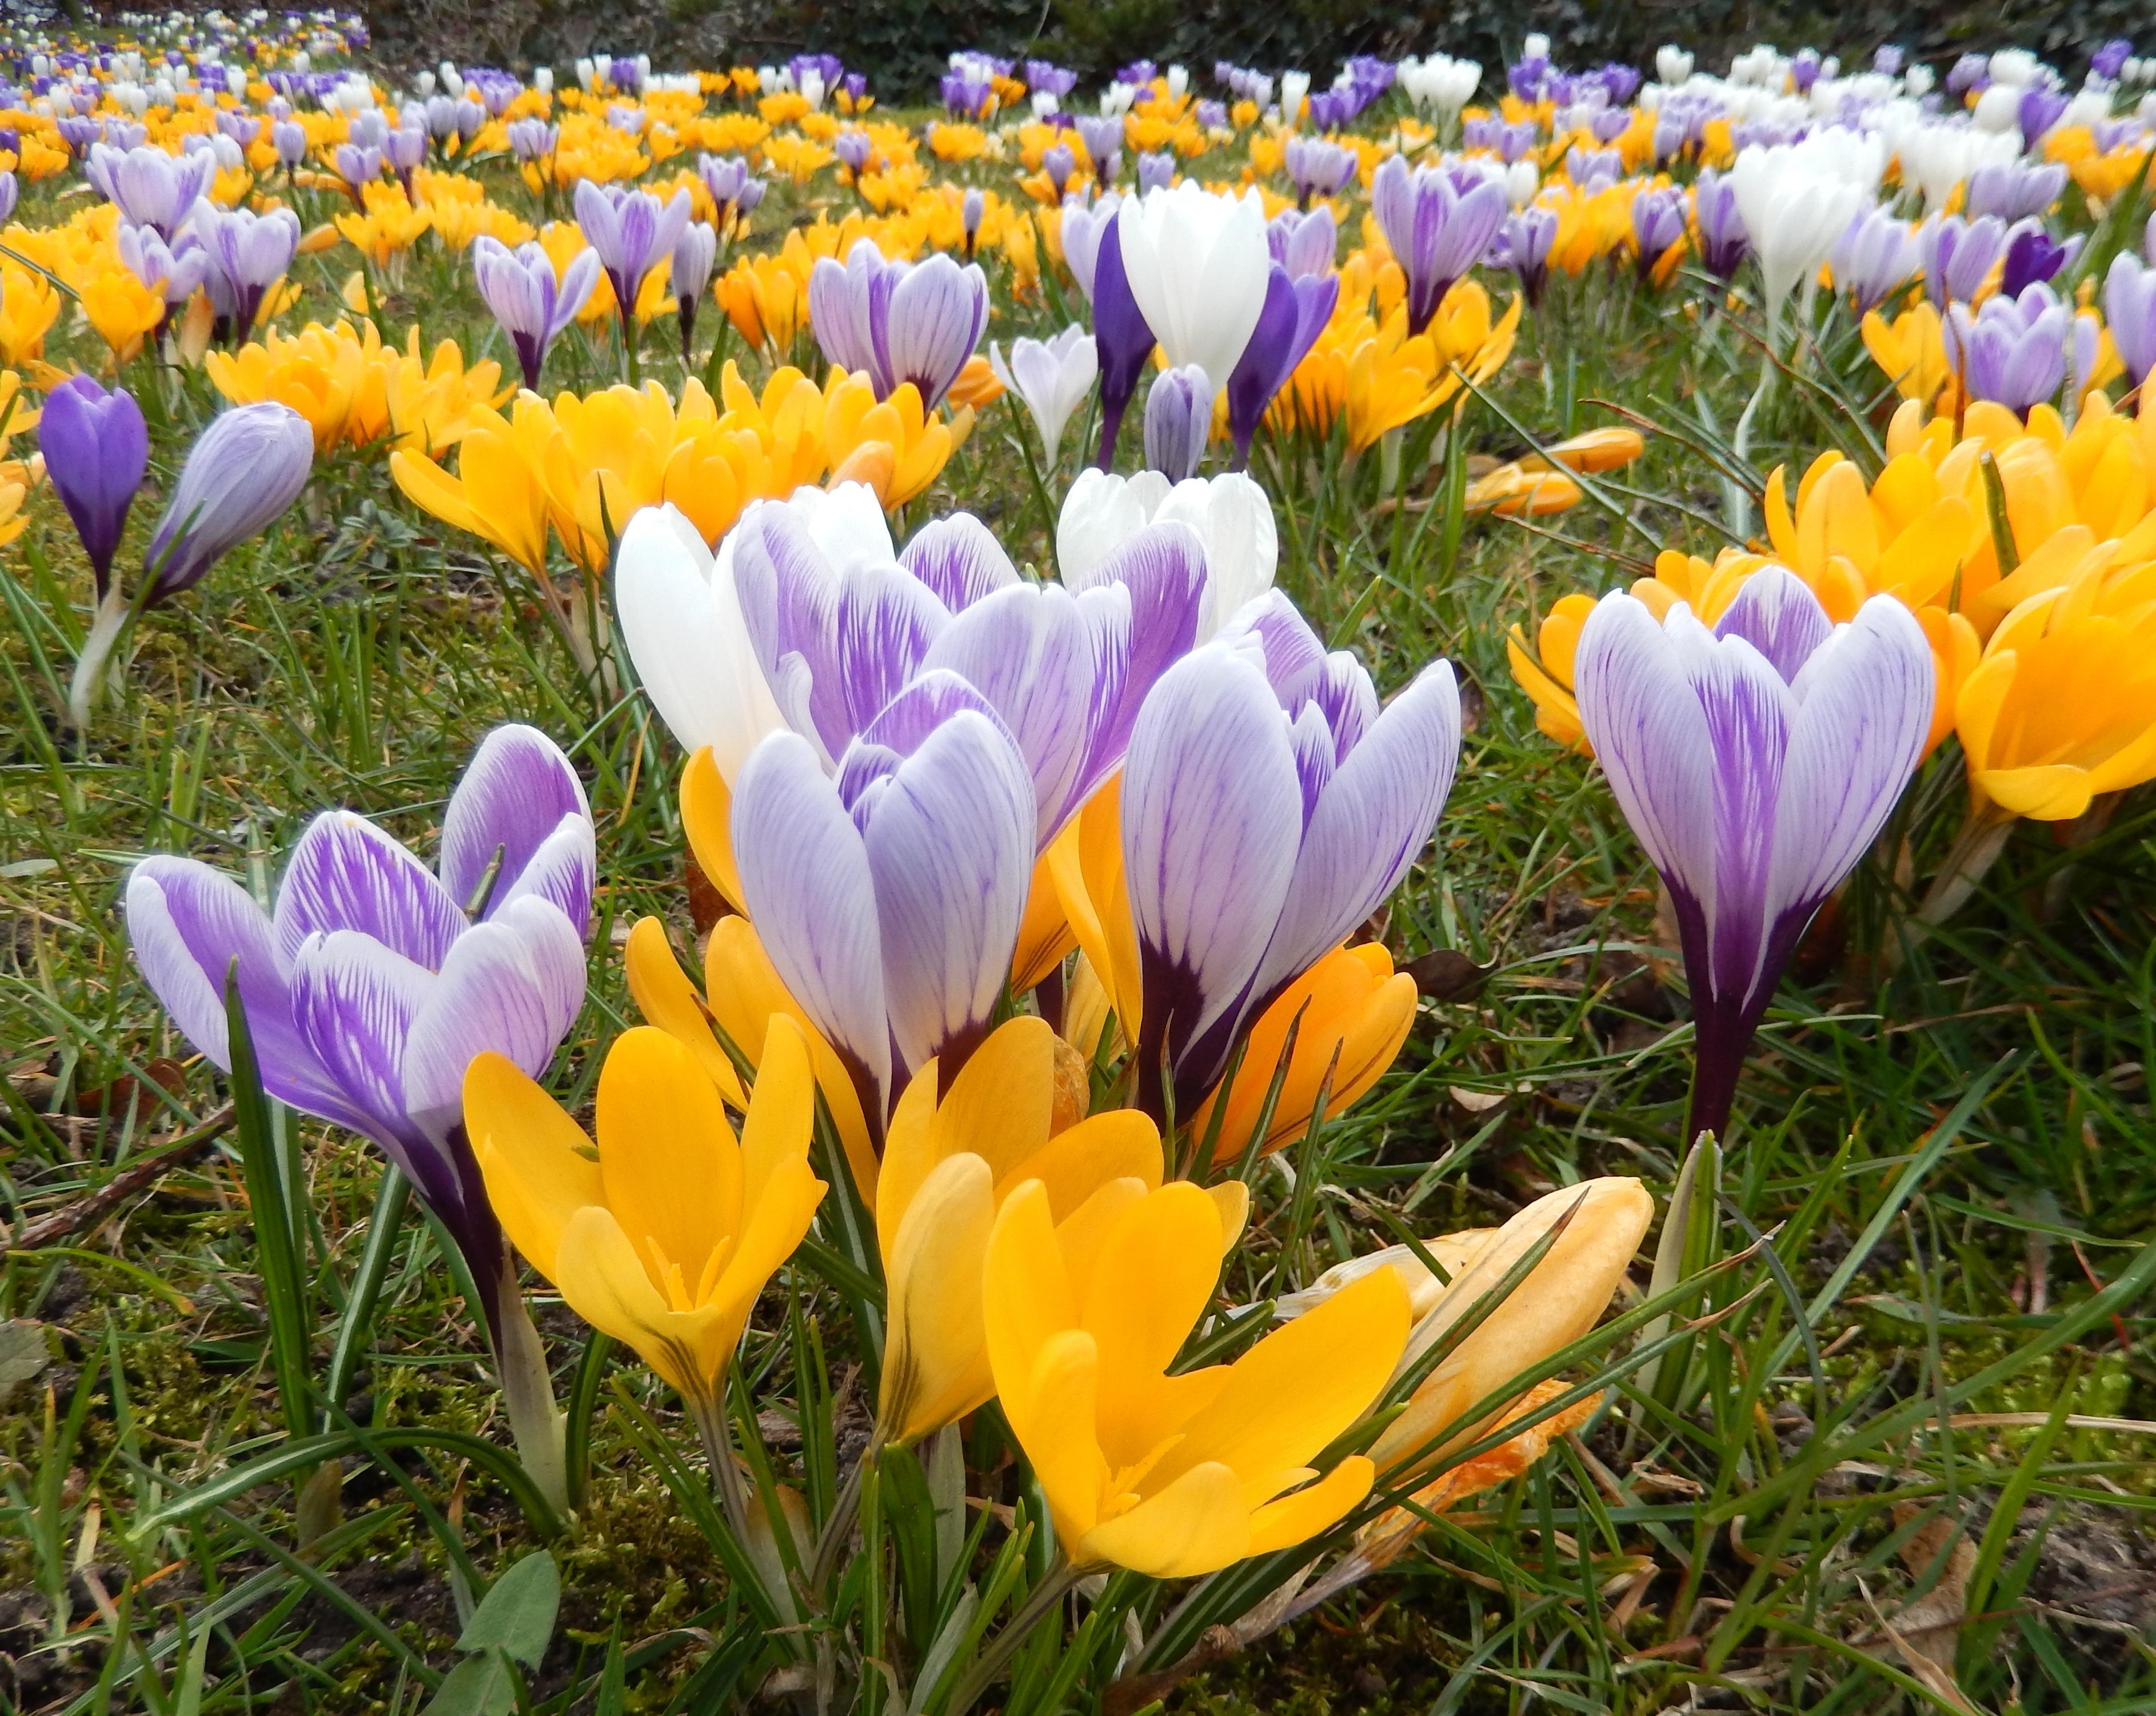 Free Images Blossom Flower Bloom Flora Flowers Harbinger Of